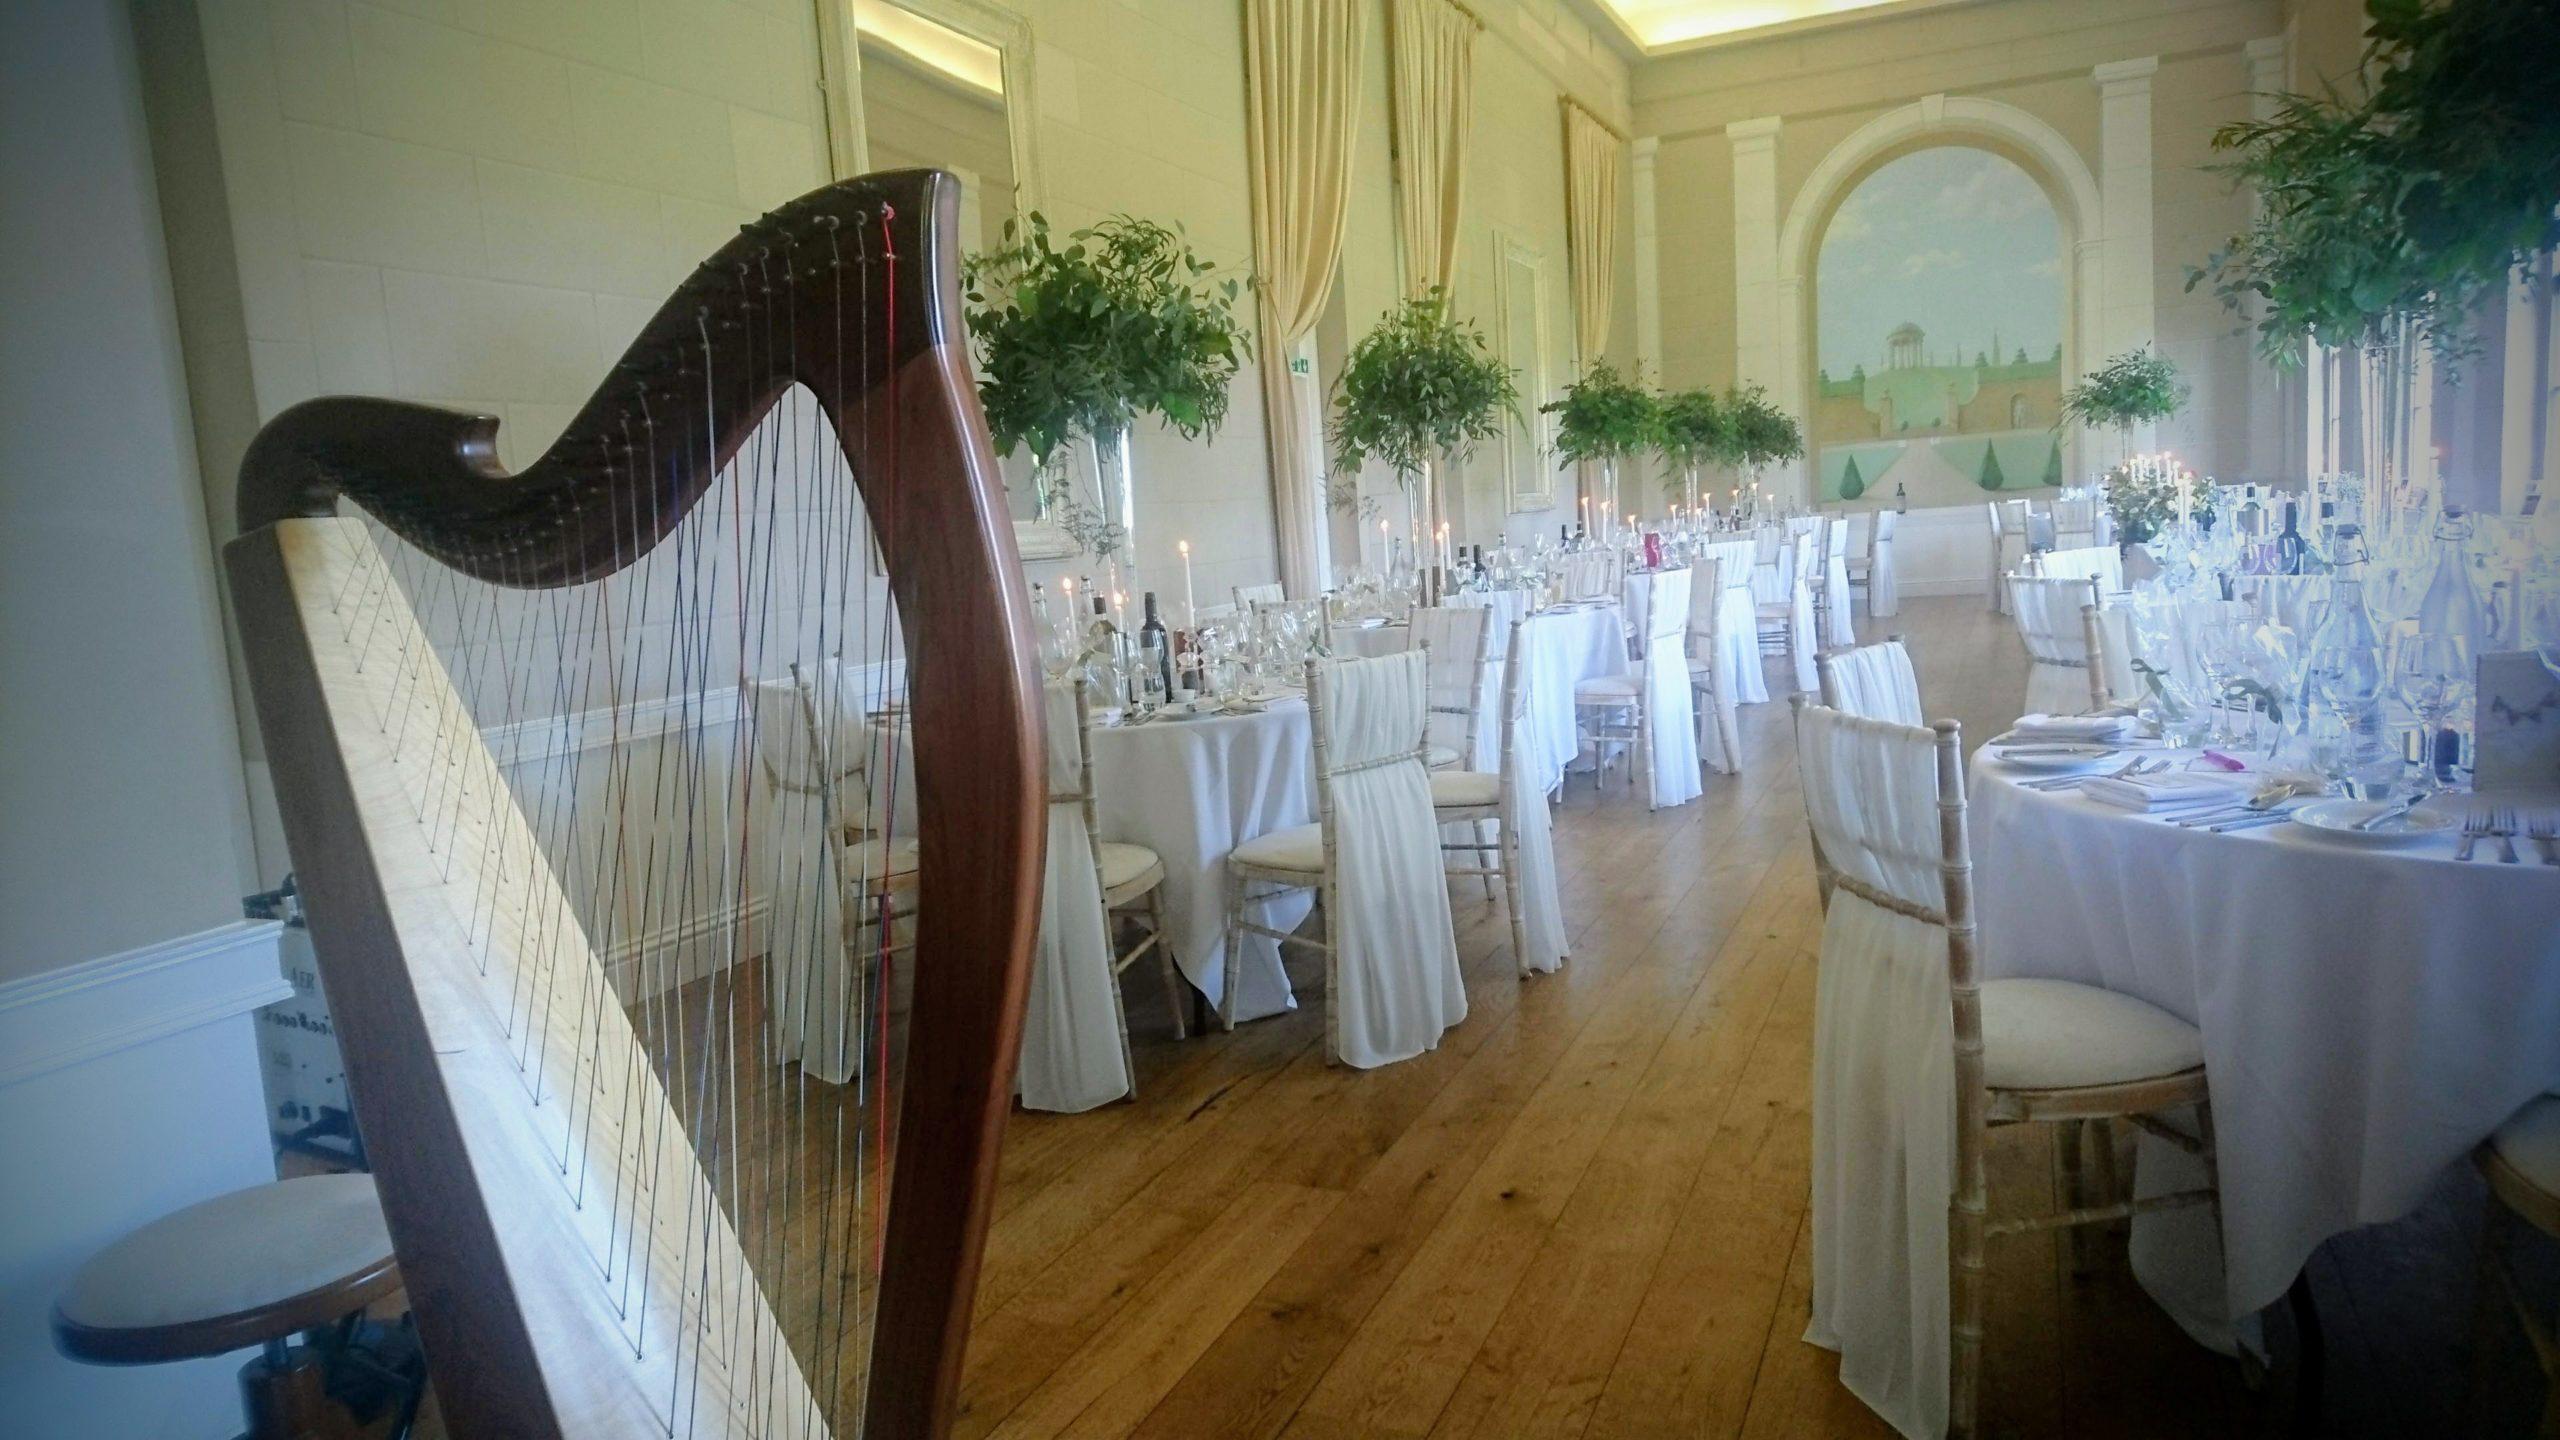 harp at wedding breakfast